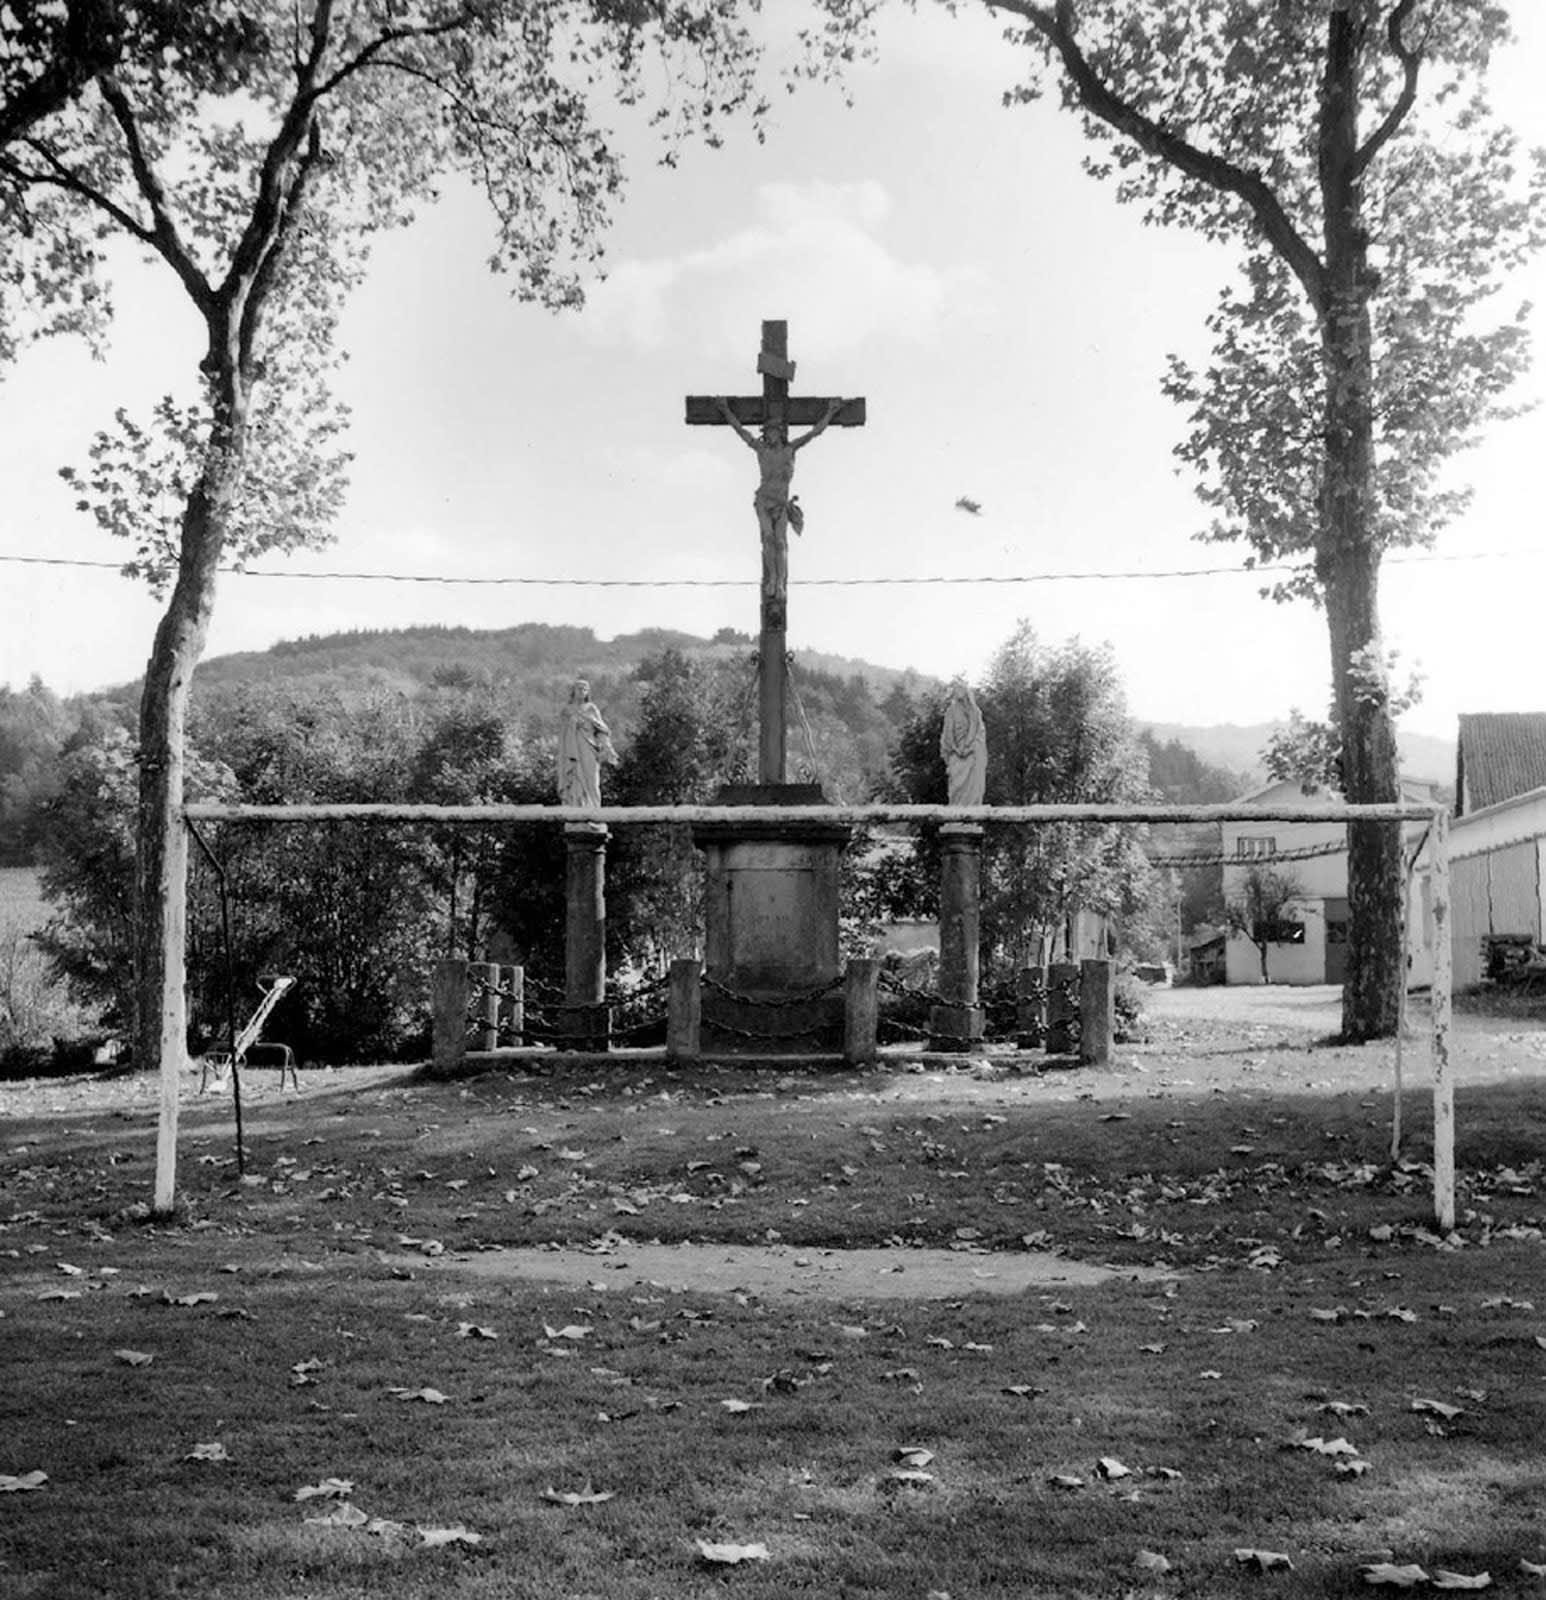 Pierre Schwartz, Saint-Jean-du-Bruel, France, 1996